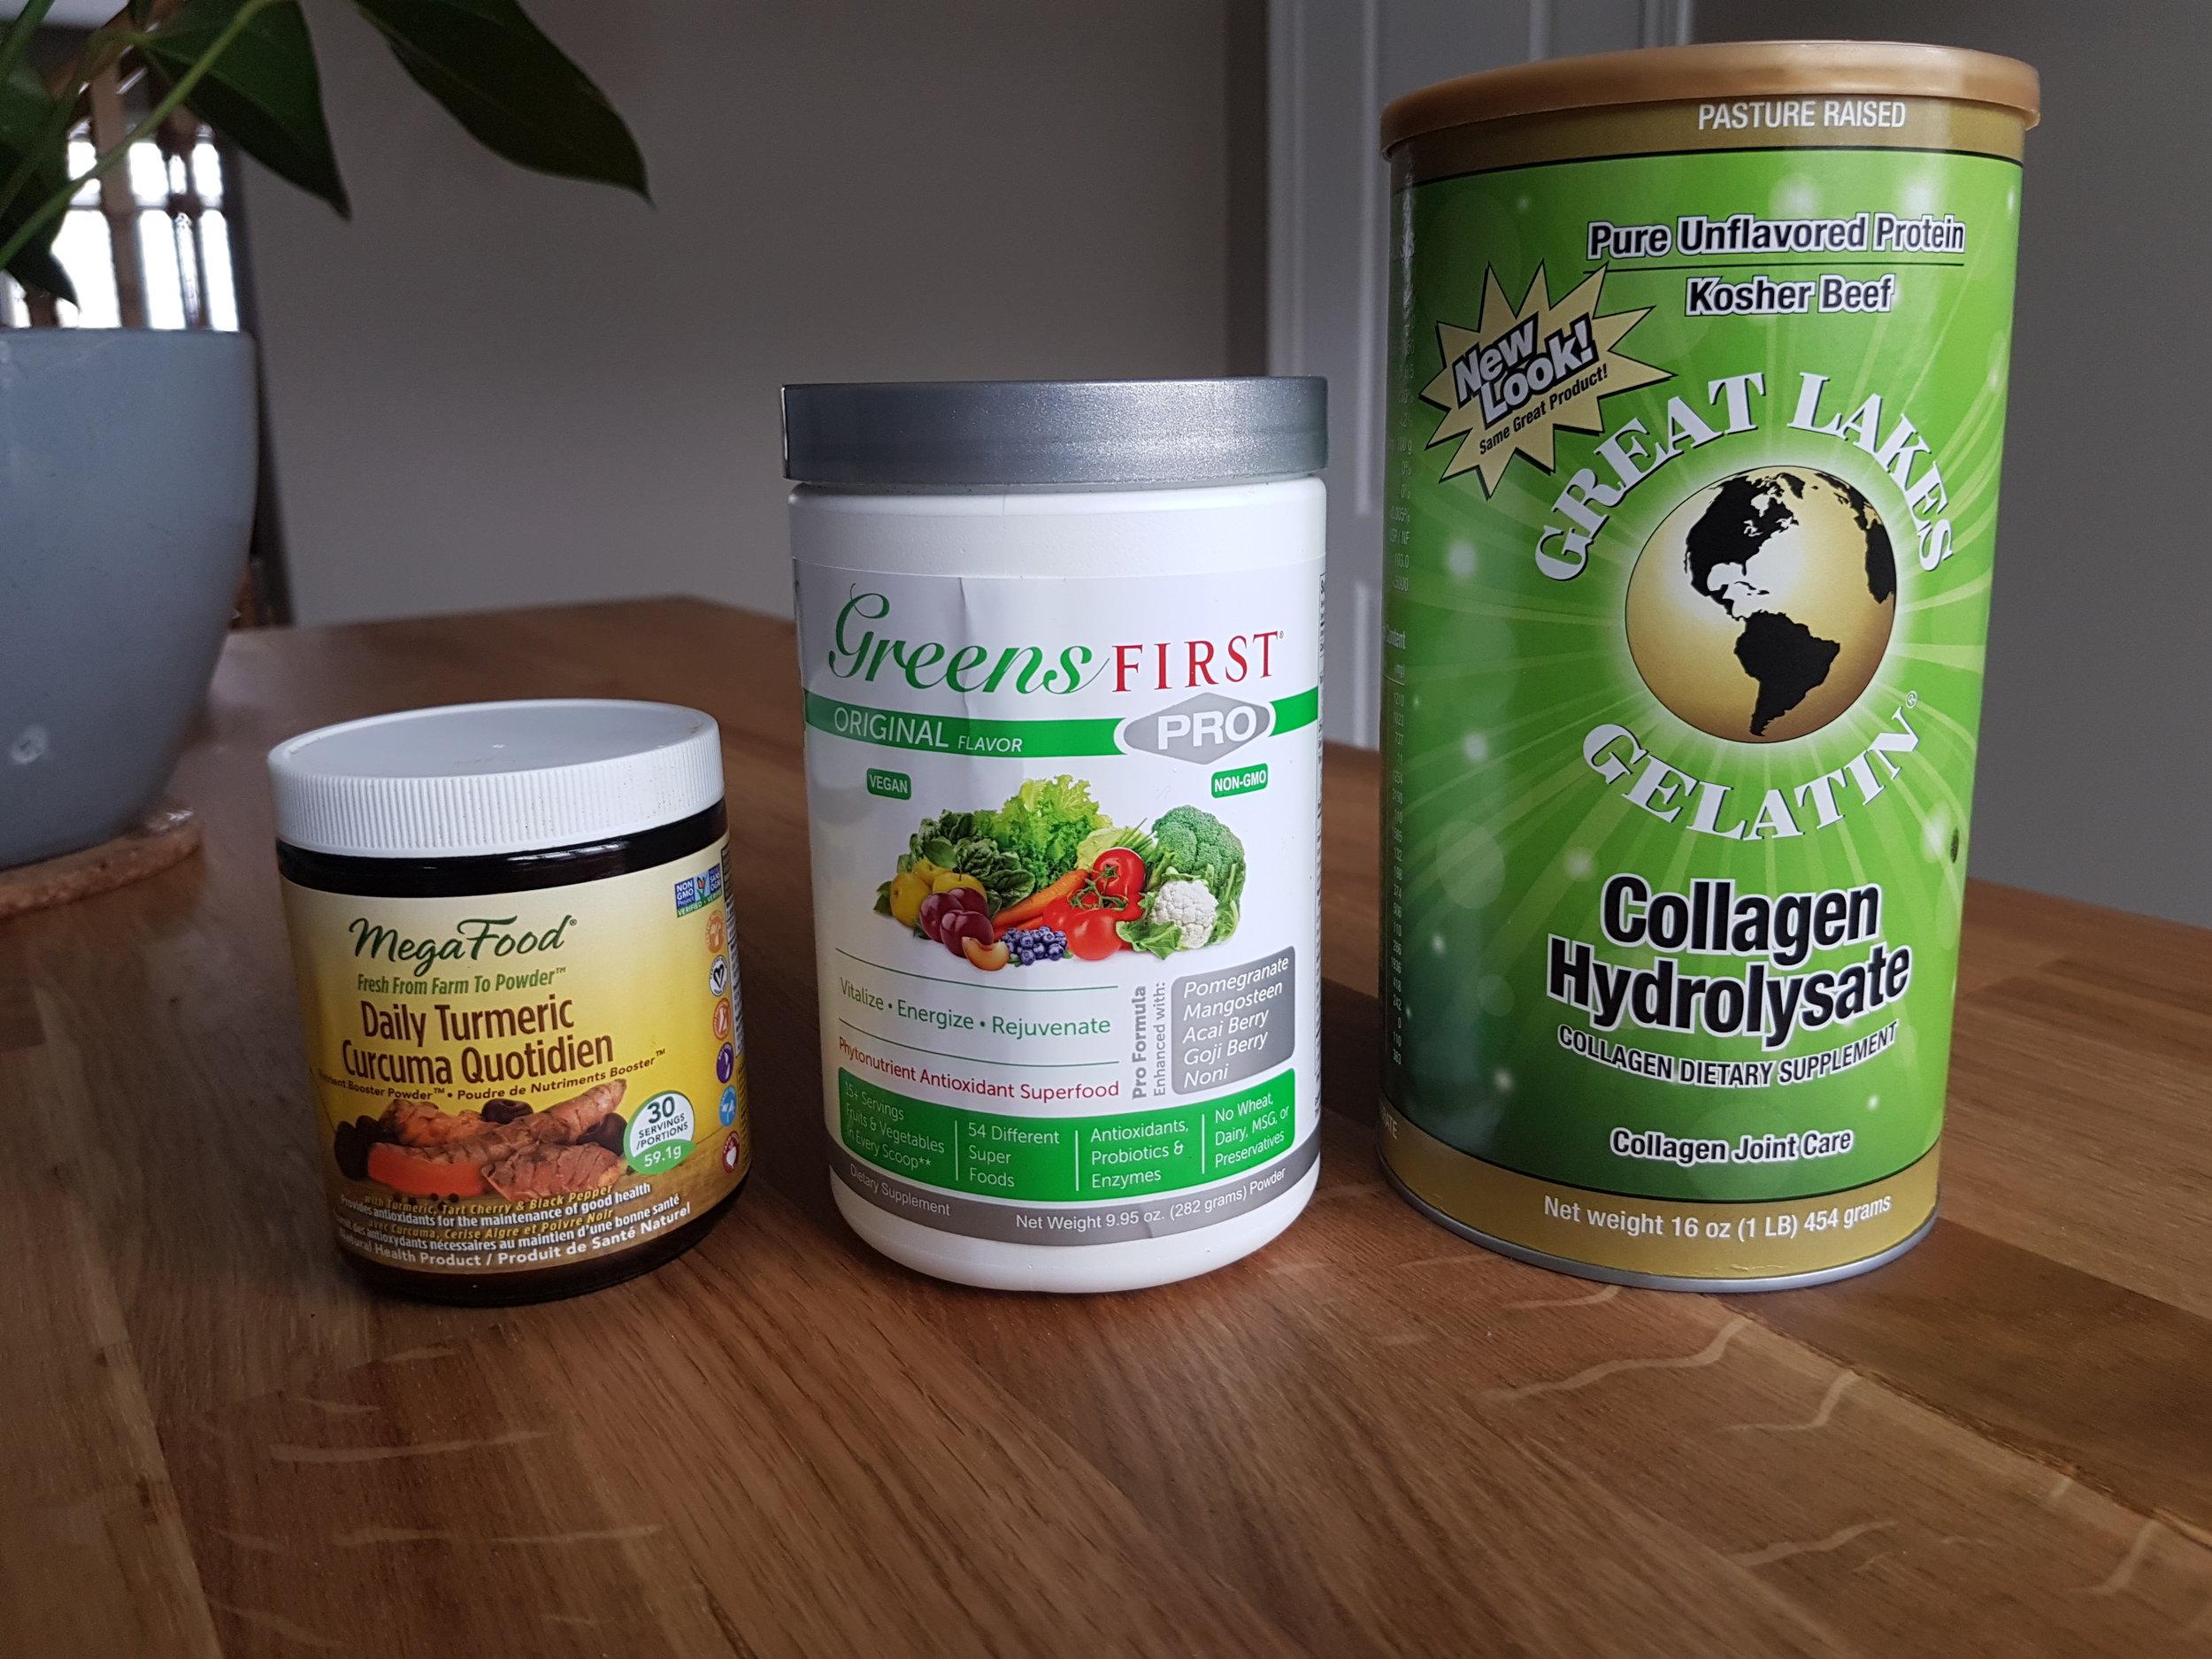 turmeric, greens supplement, hydrolyzed collagen